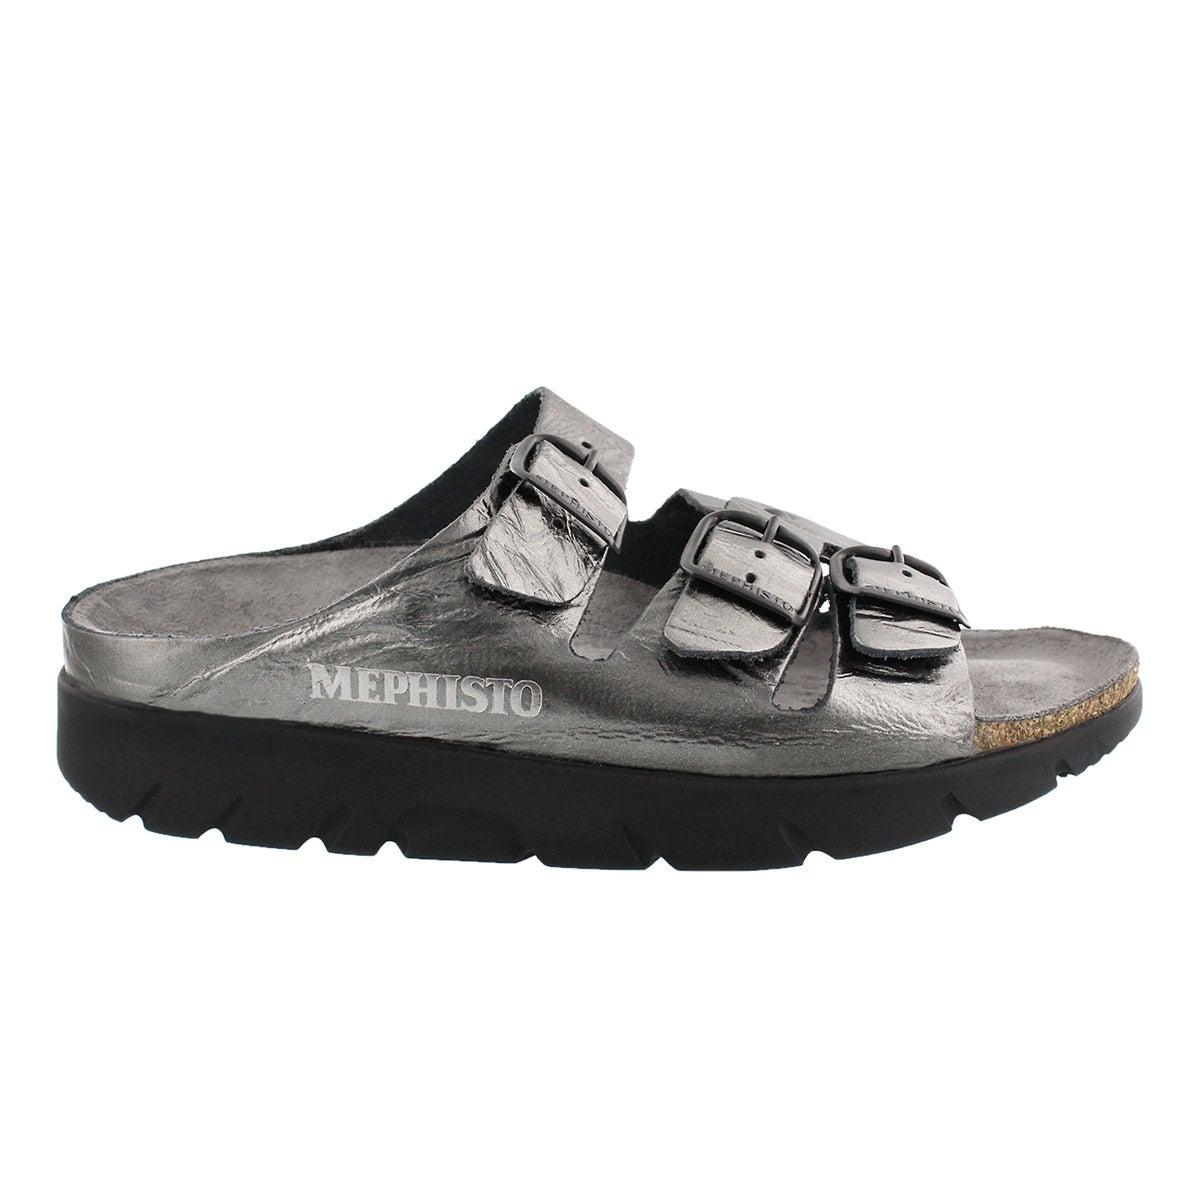 dcba45fbc1 Mephisto | Sandals | SoftMoc.com